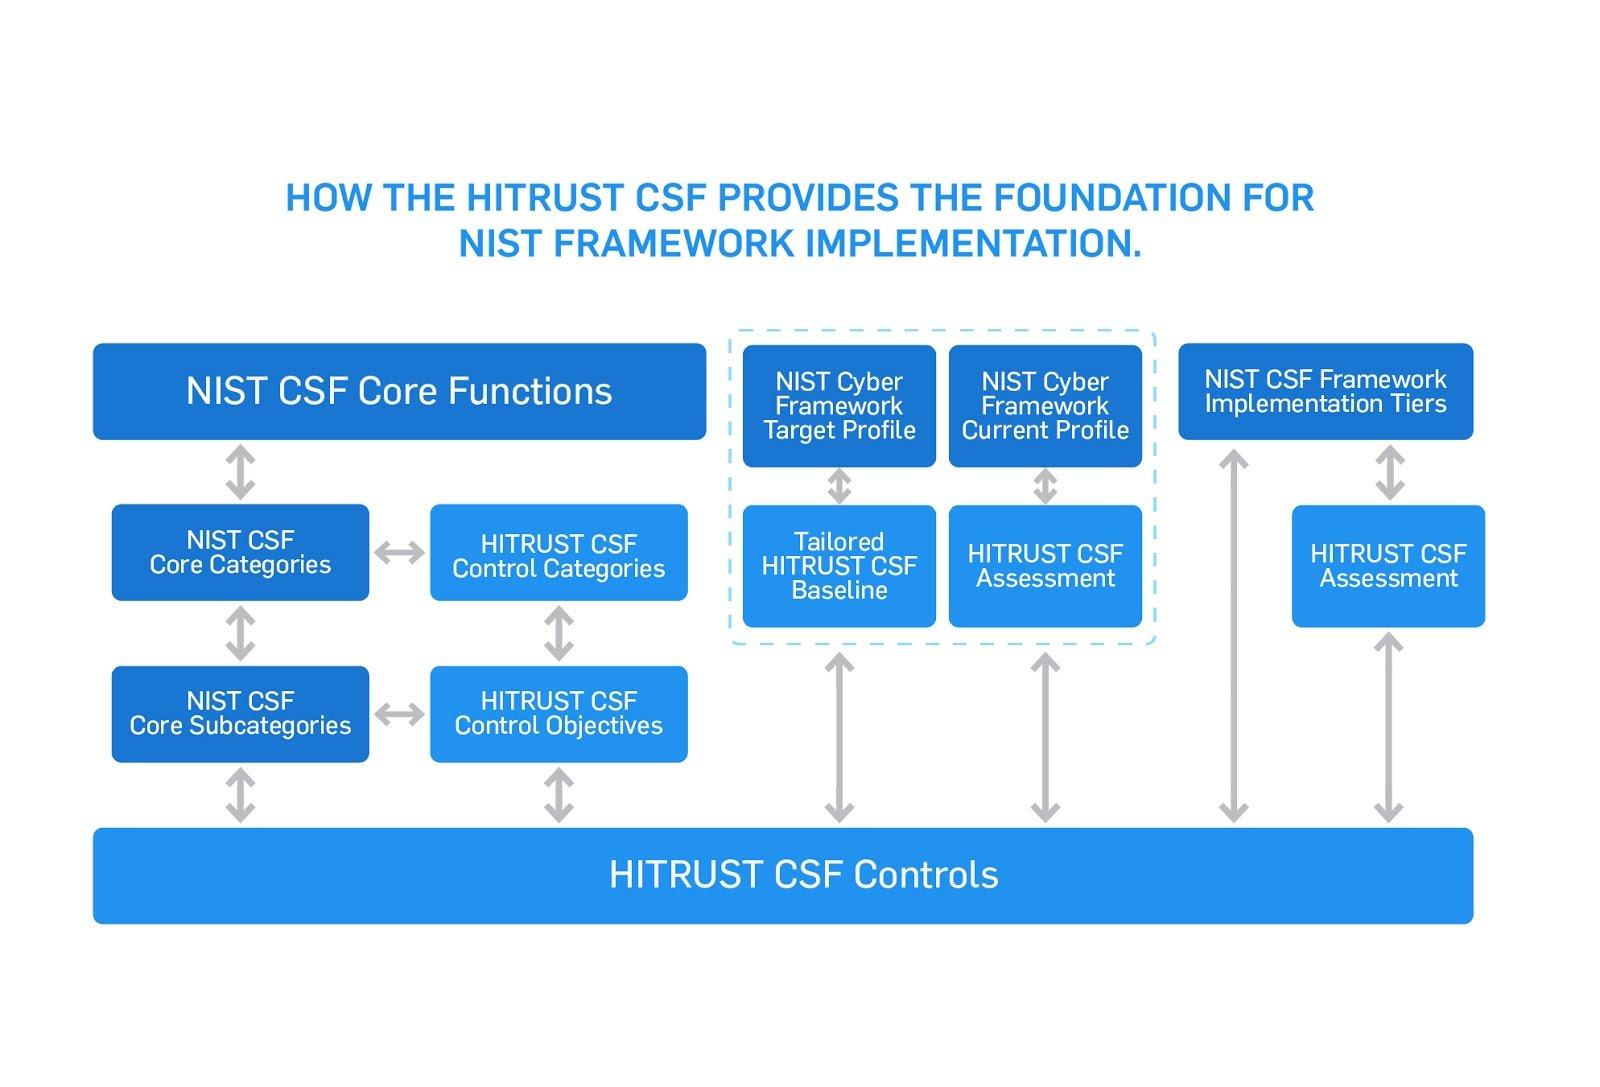 HITRUST CSF controls and NIST